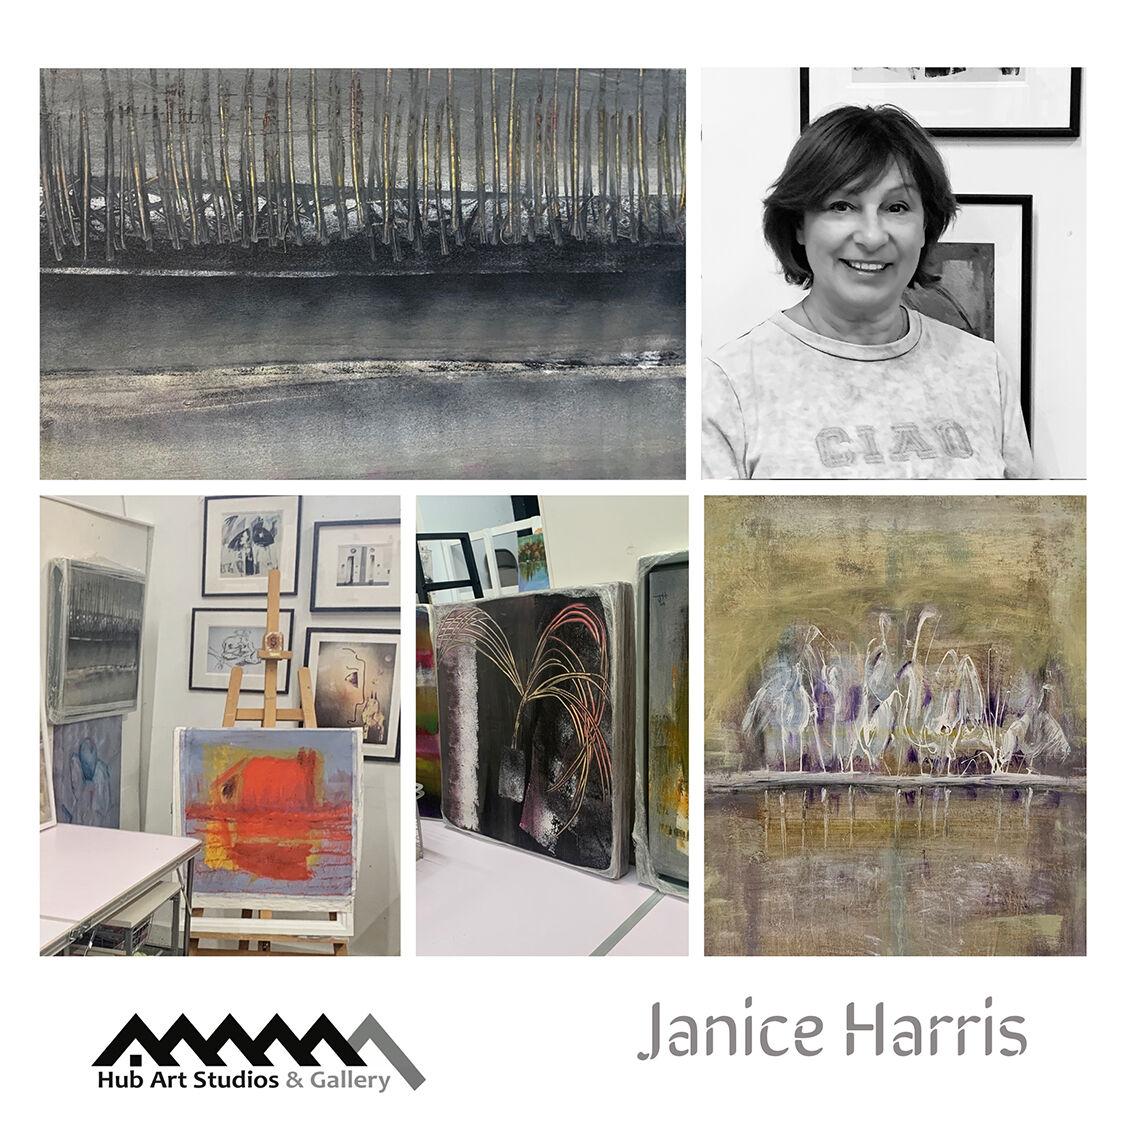 Janice Harris